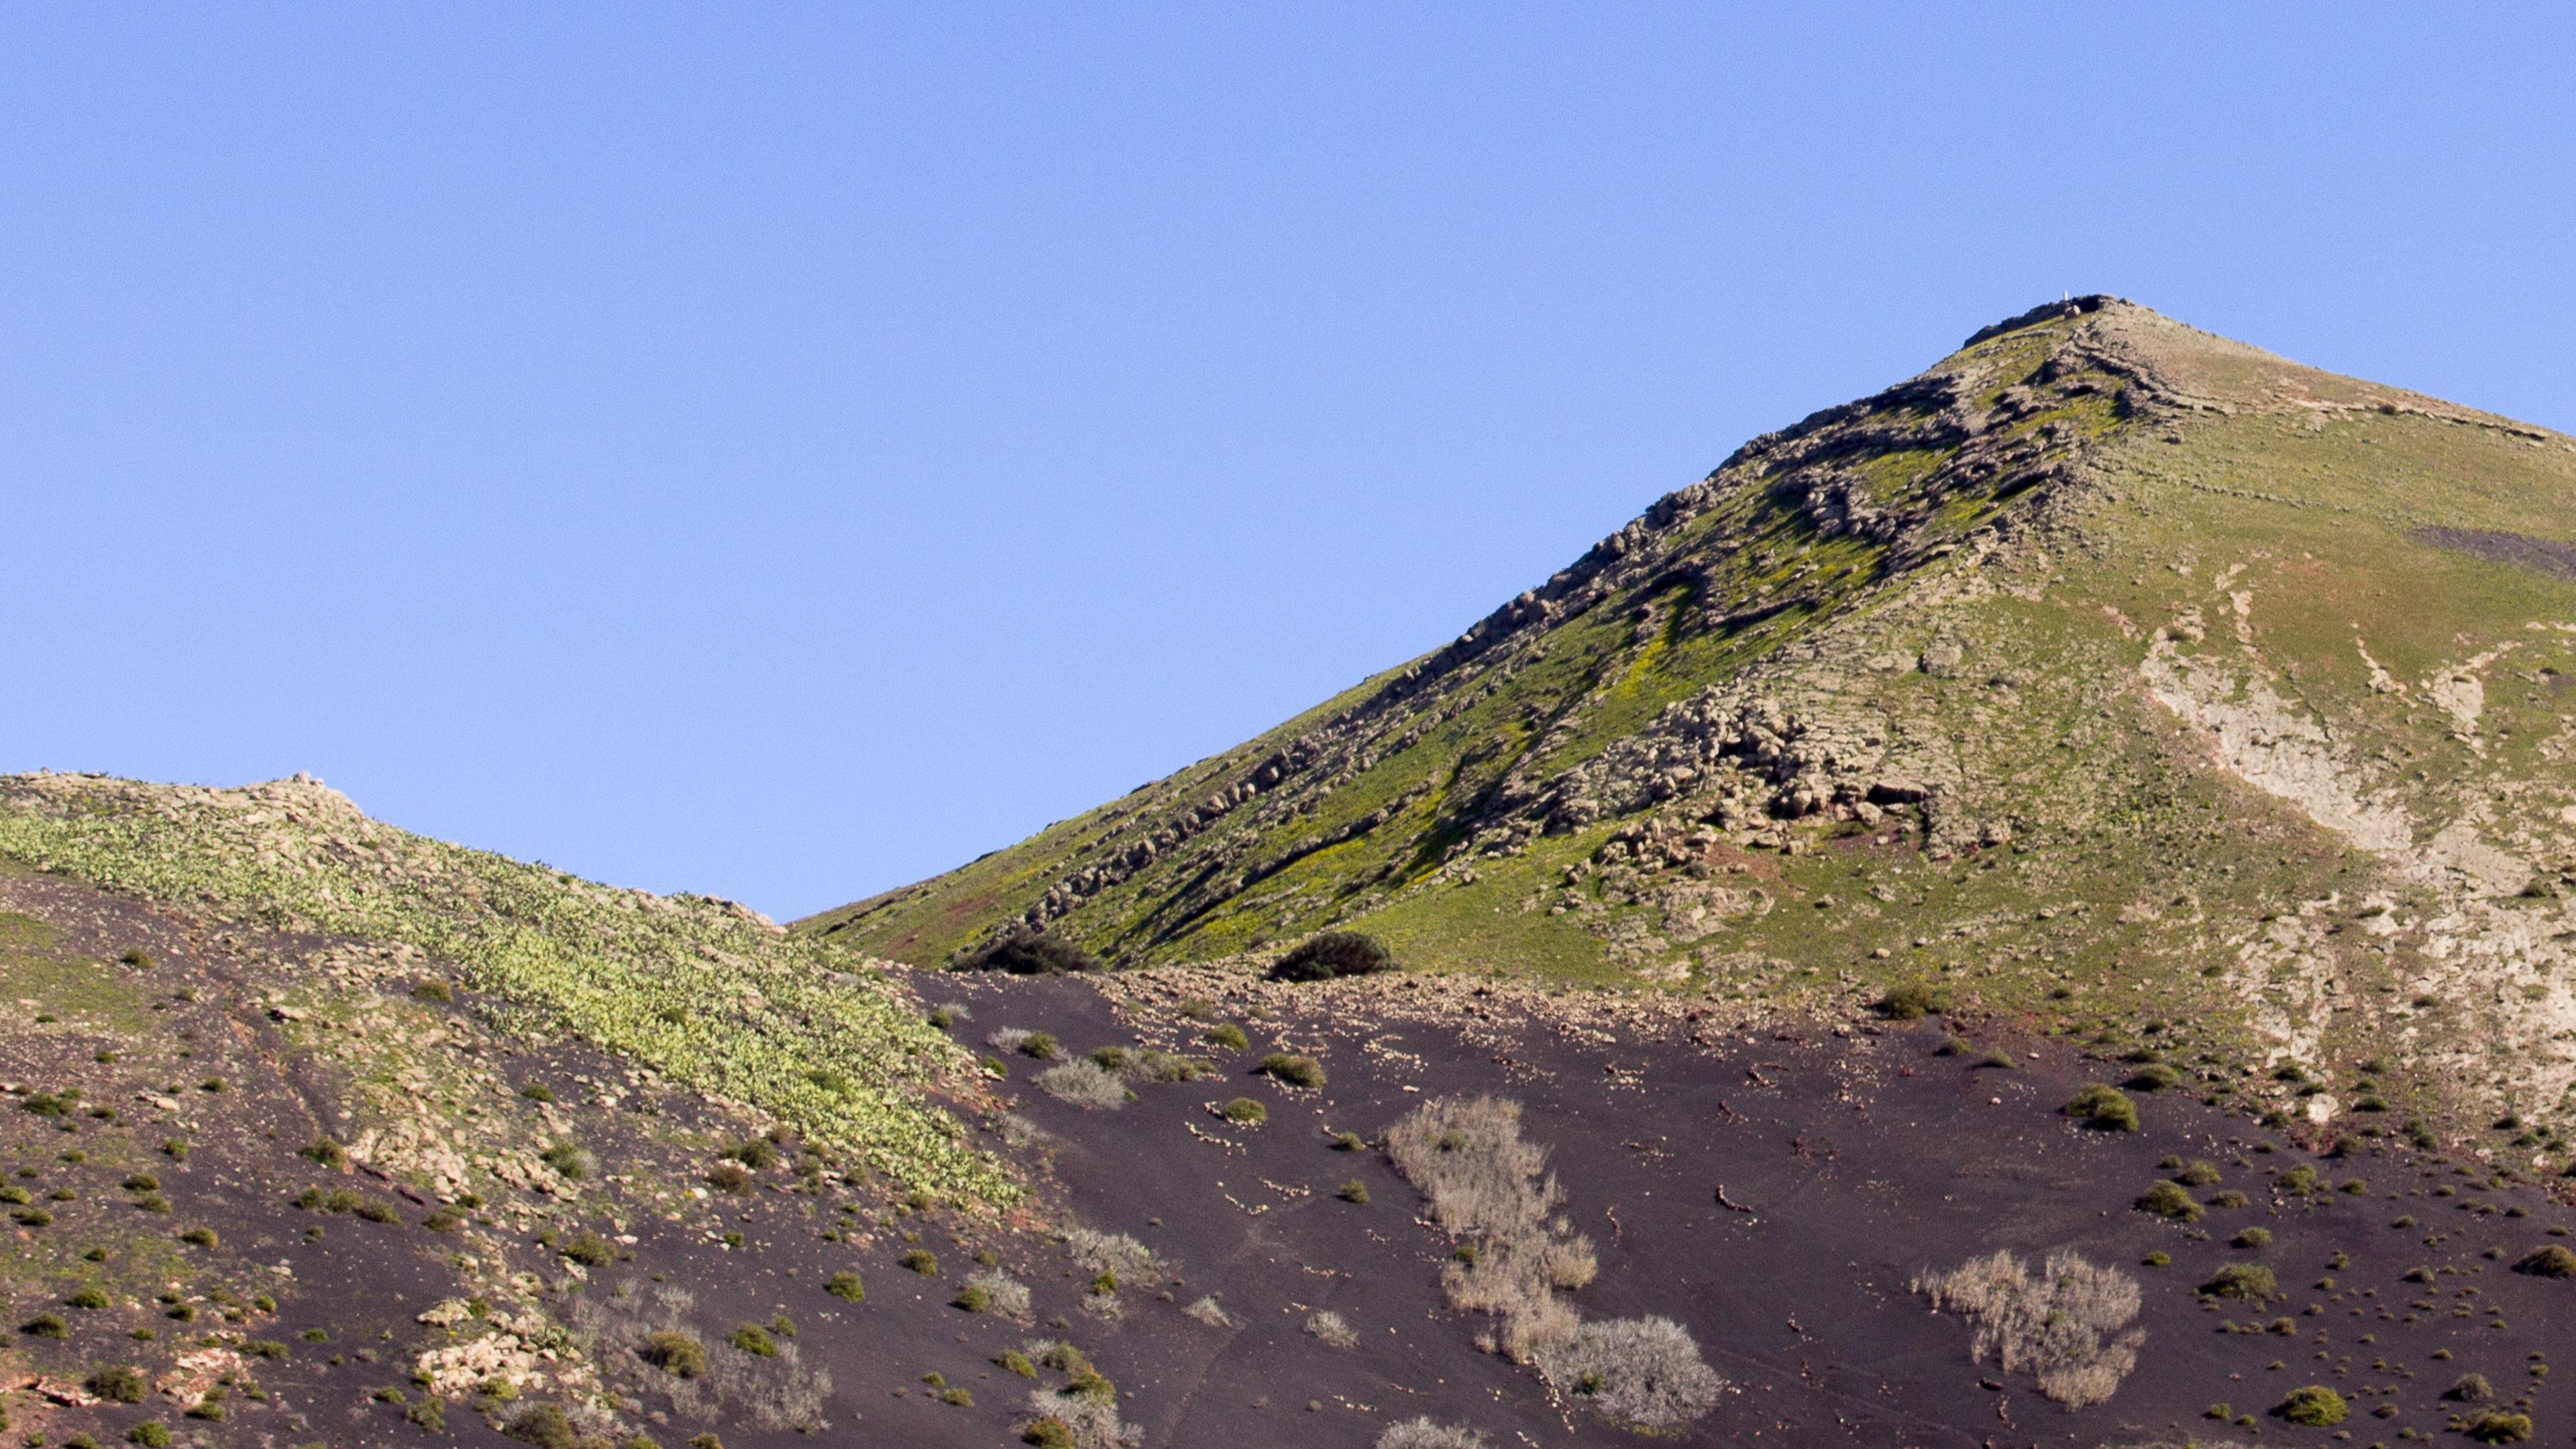 YouTube Whitewall Lanzarote Lava Huegel und Vulkane 06 Juni